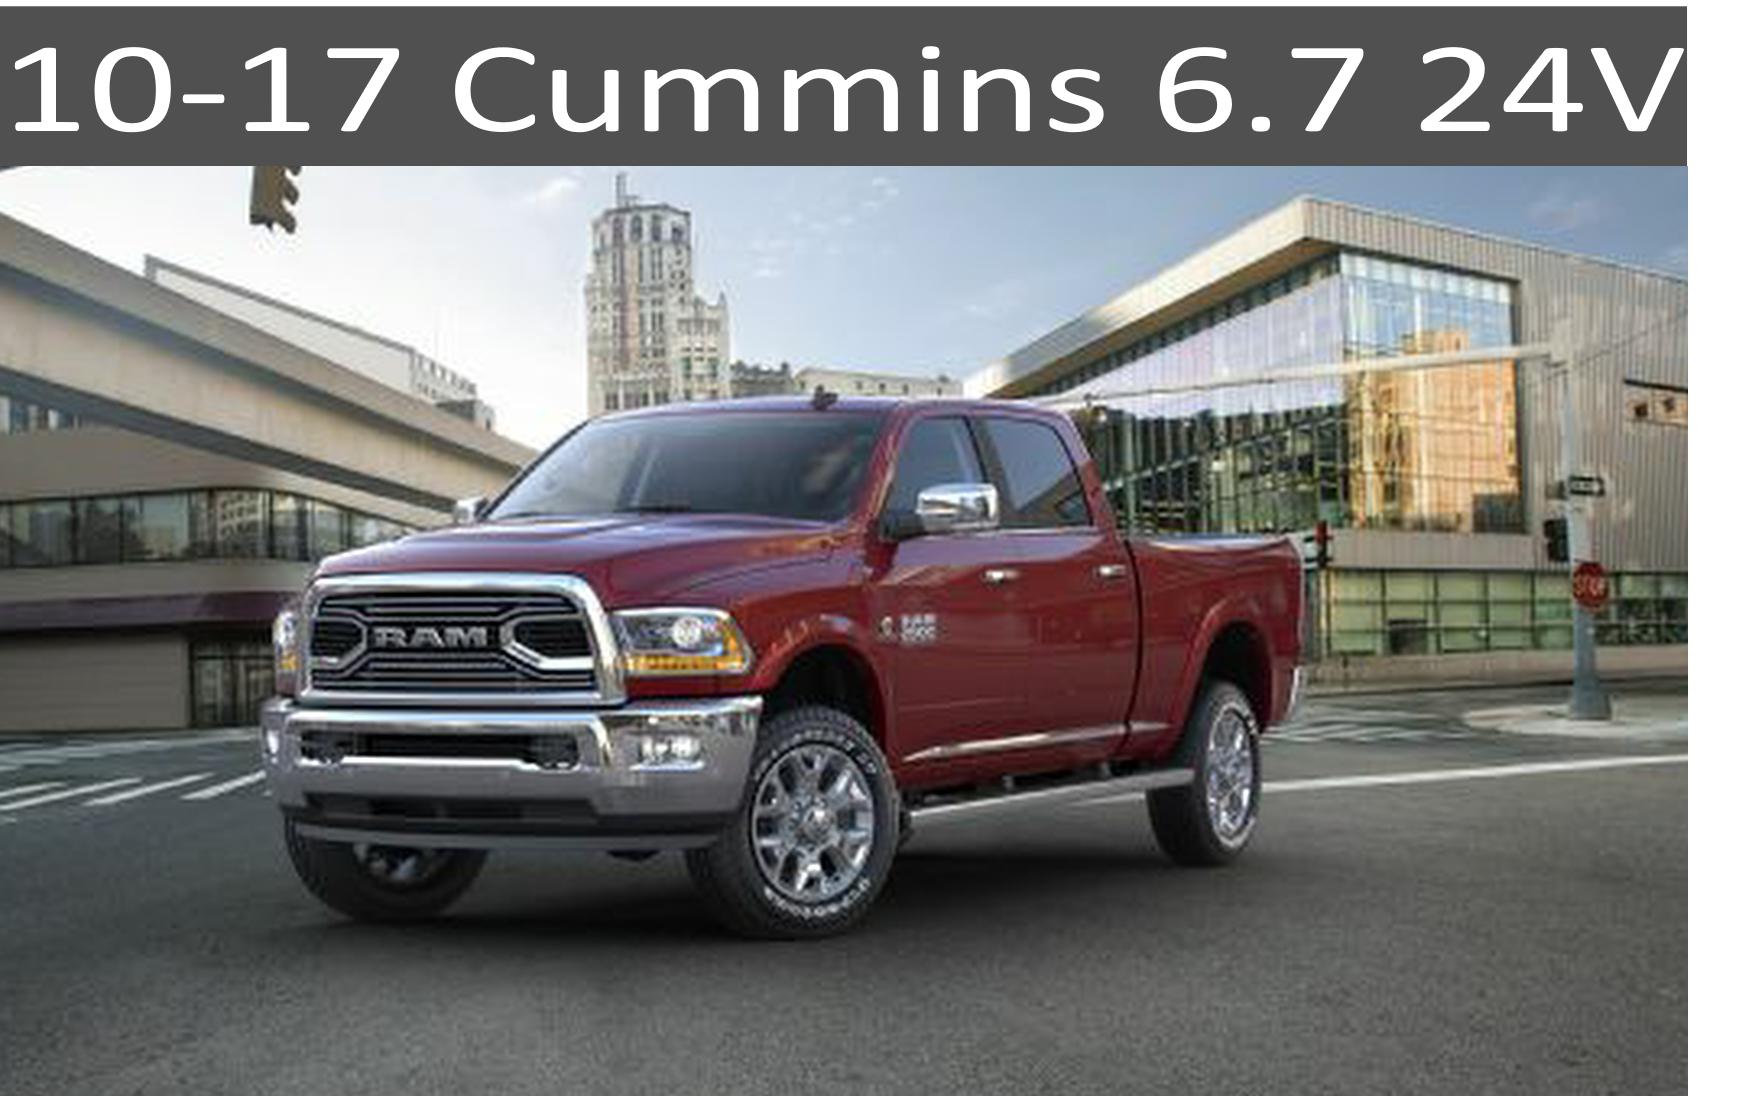 10-17 Dodge Cummins 6.7 Parts